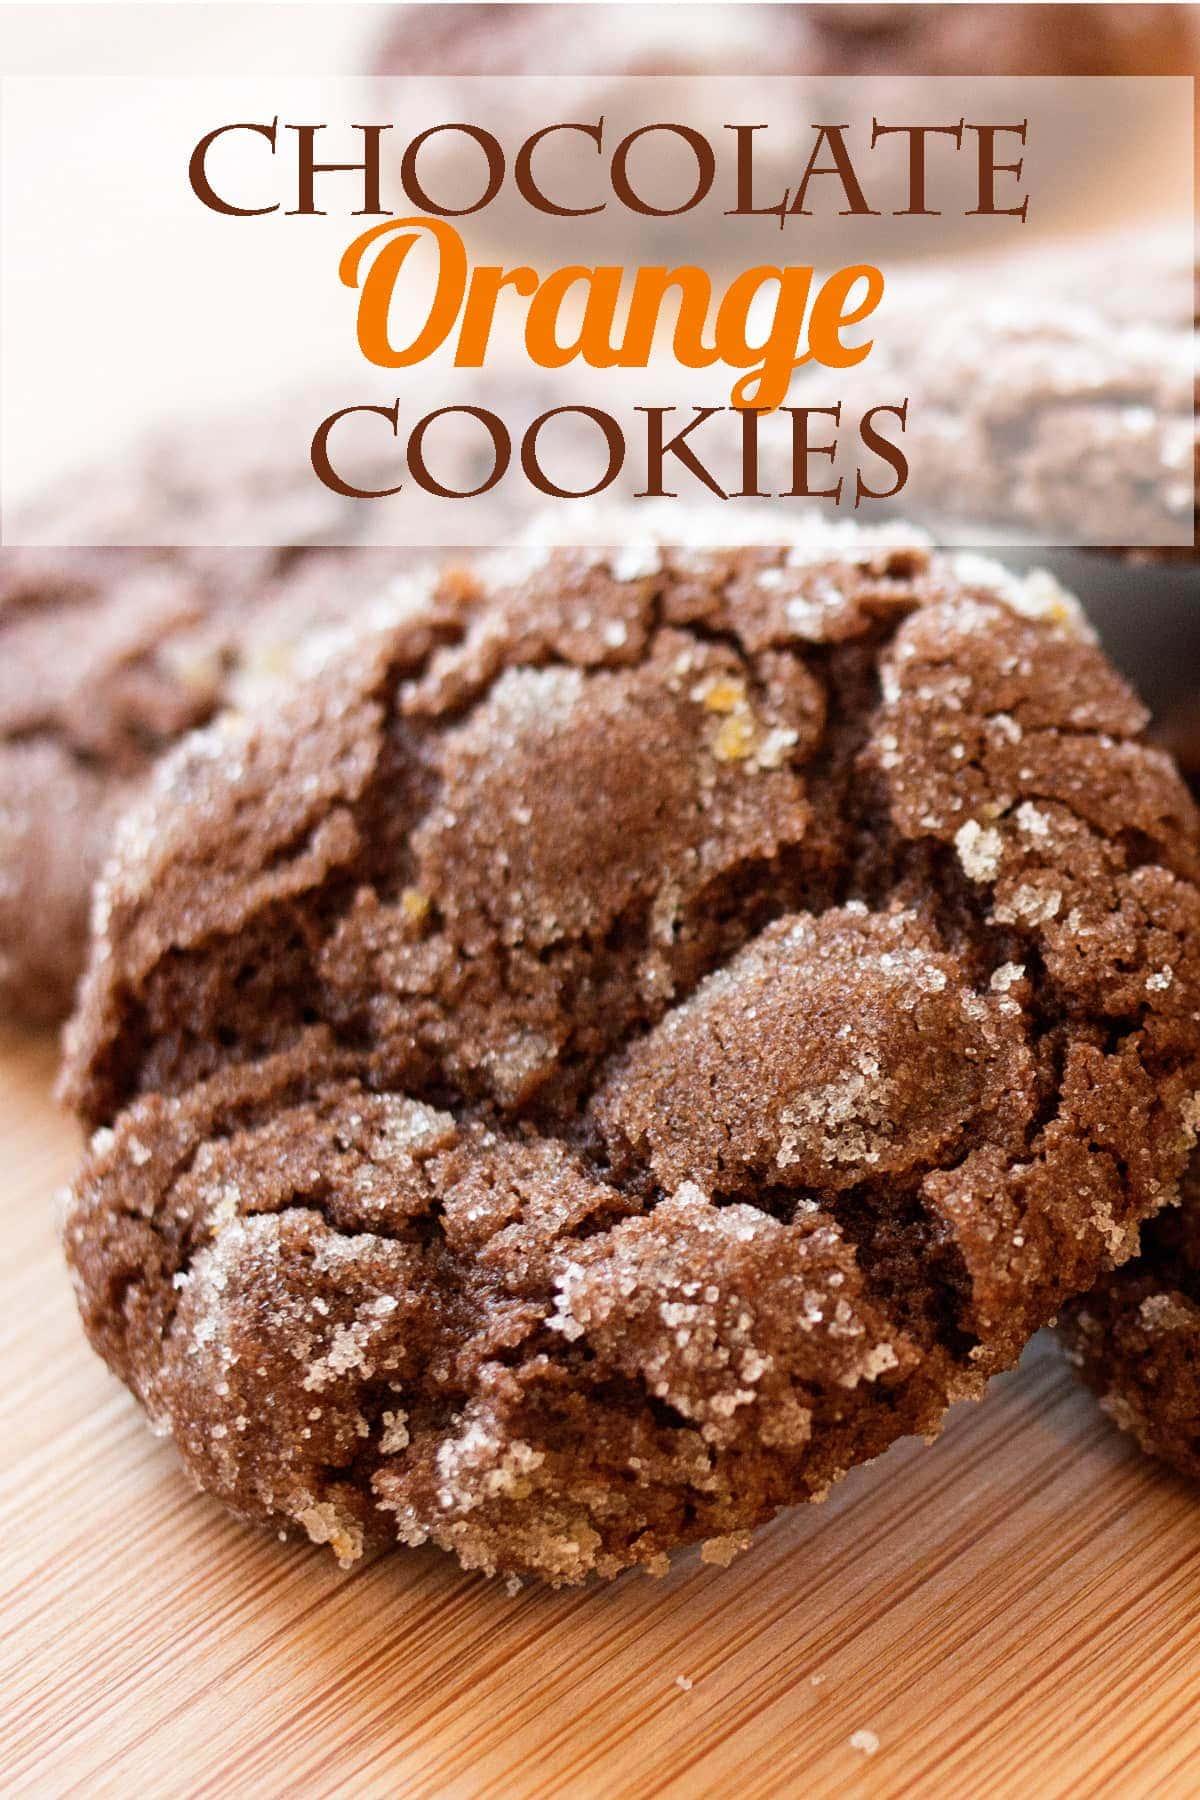 Social media image for chocolate orange cookies